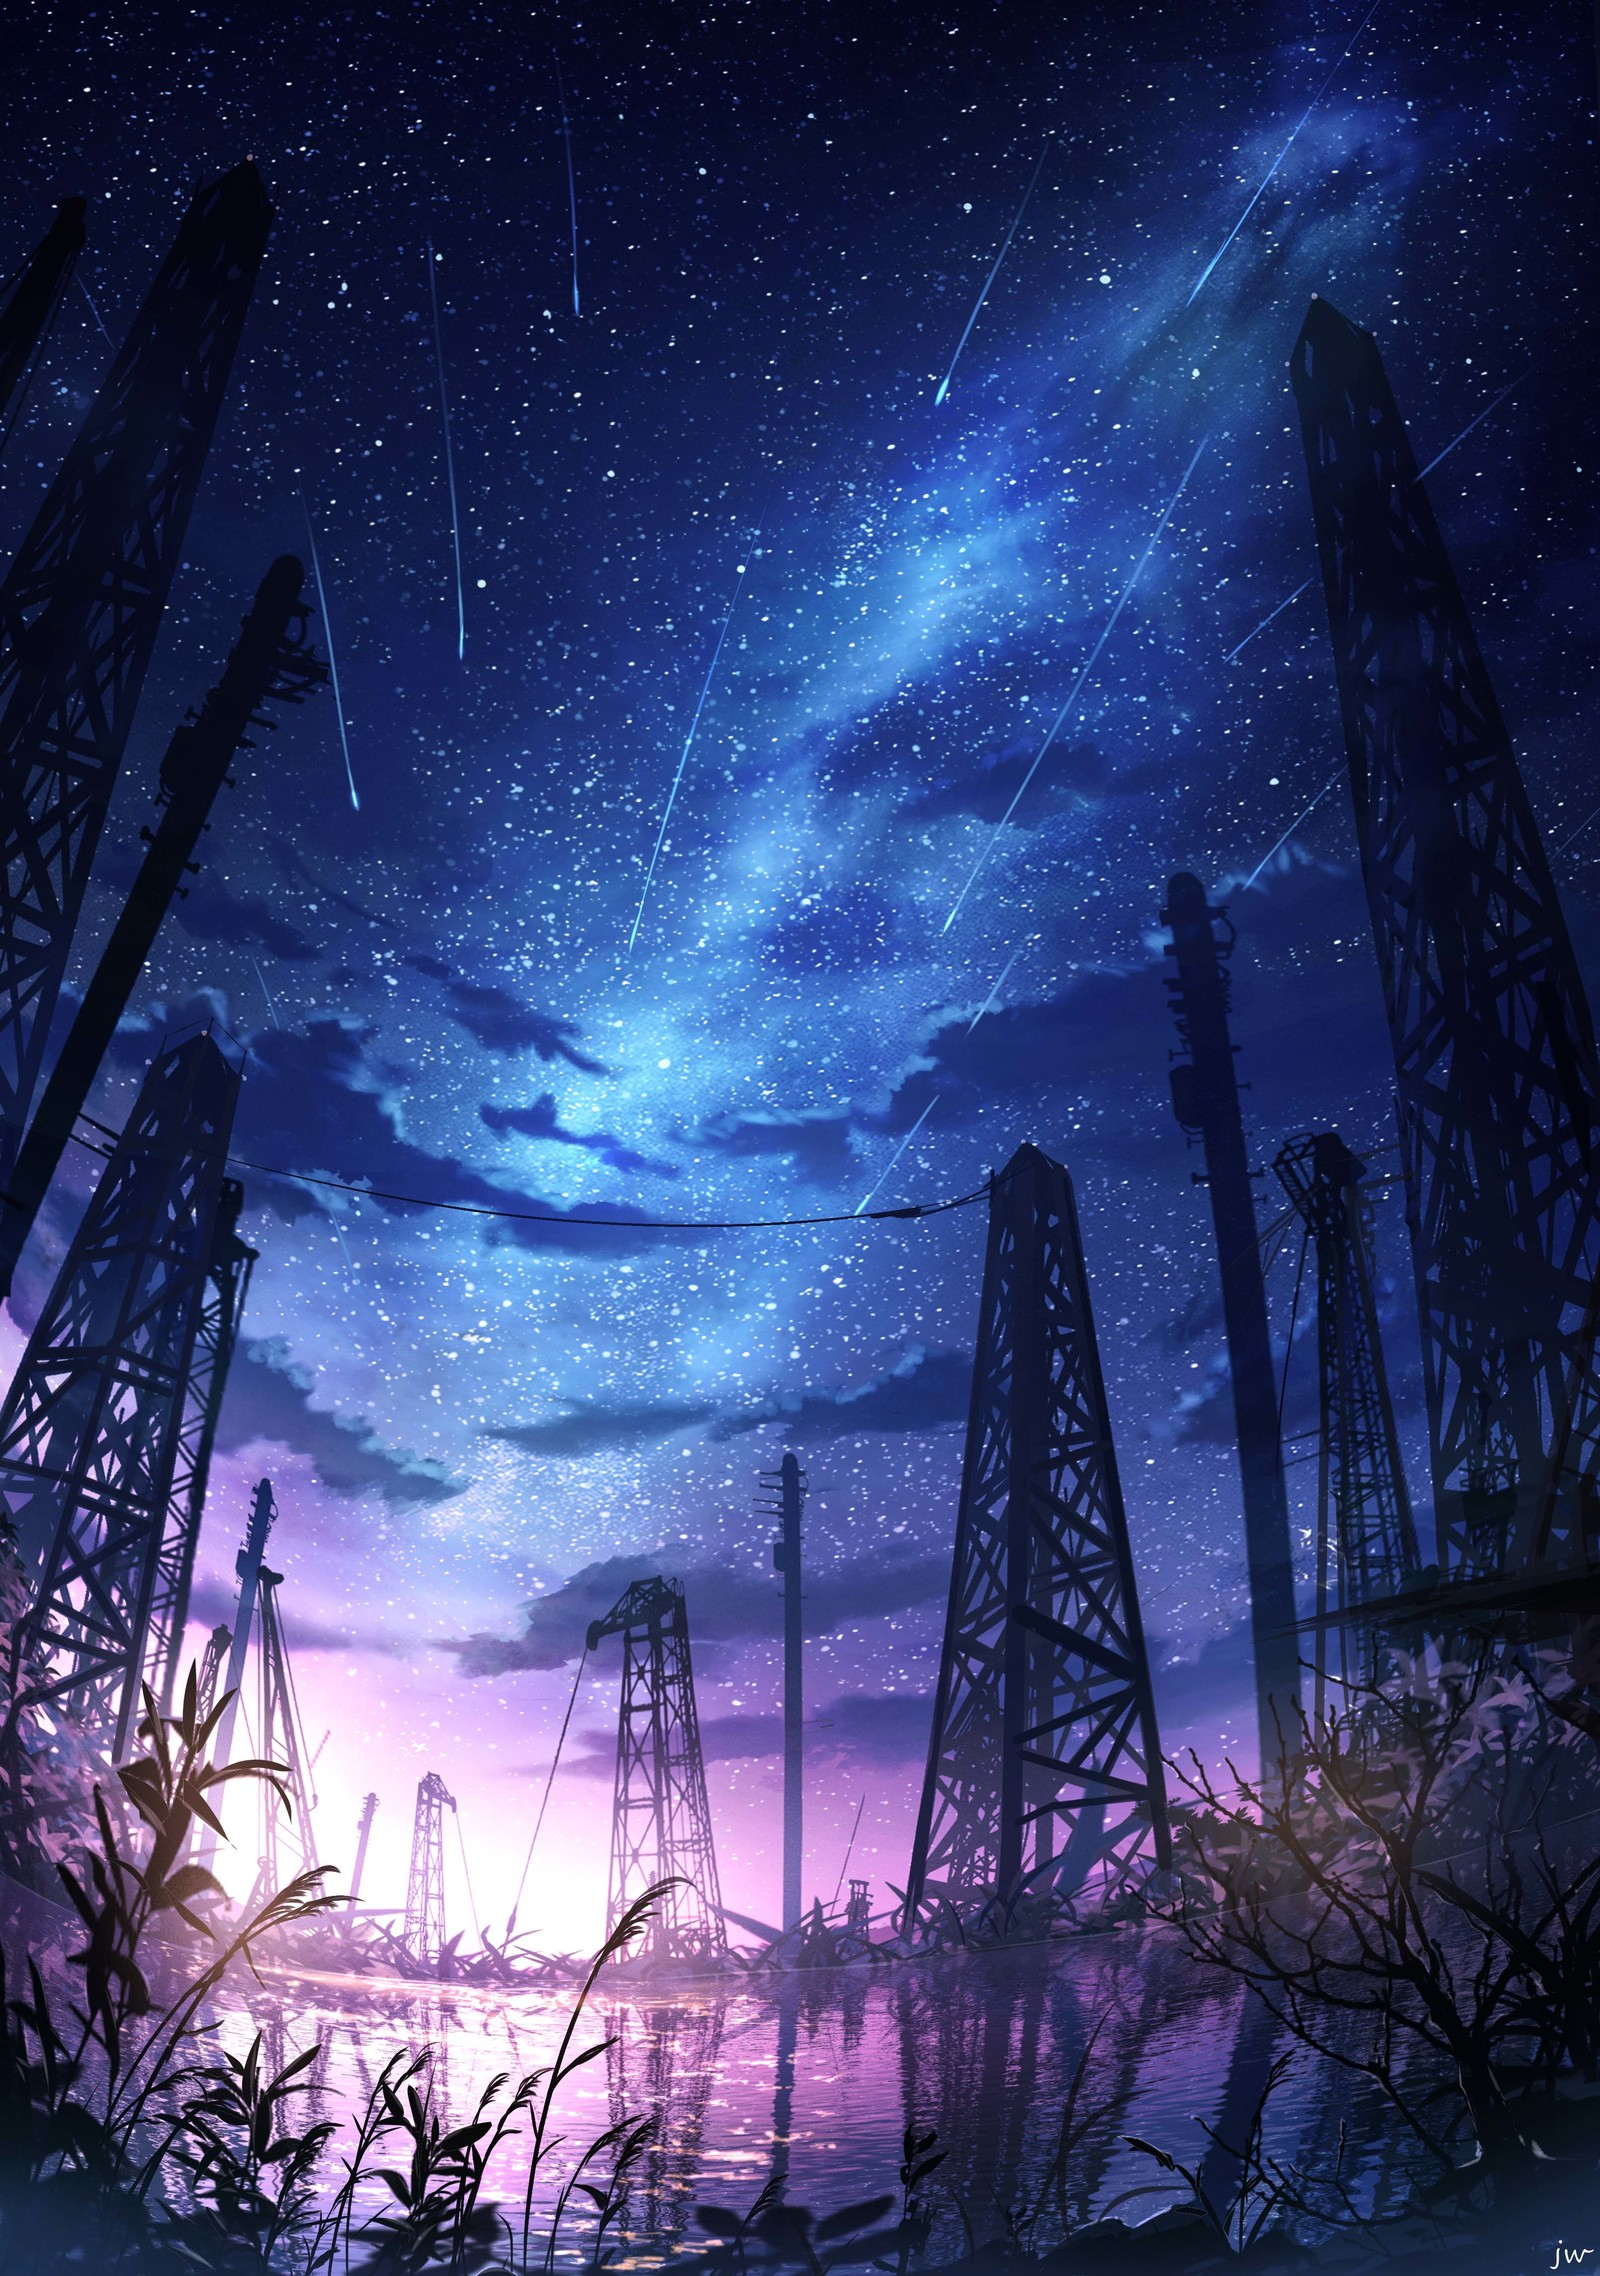 P站画师作品芦苇旁の星光